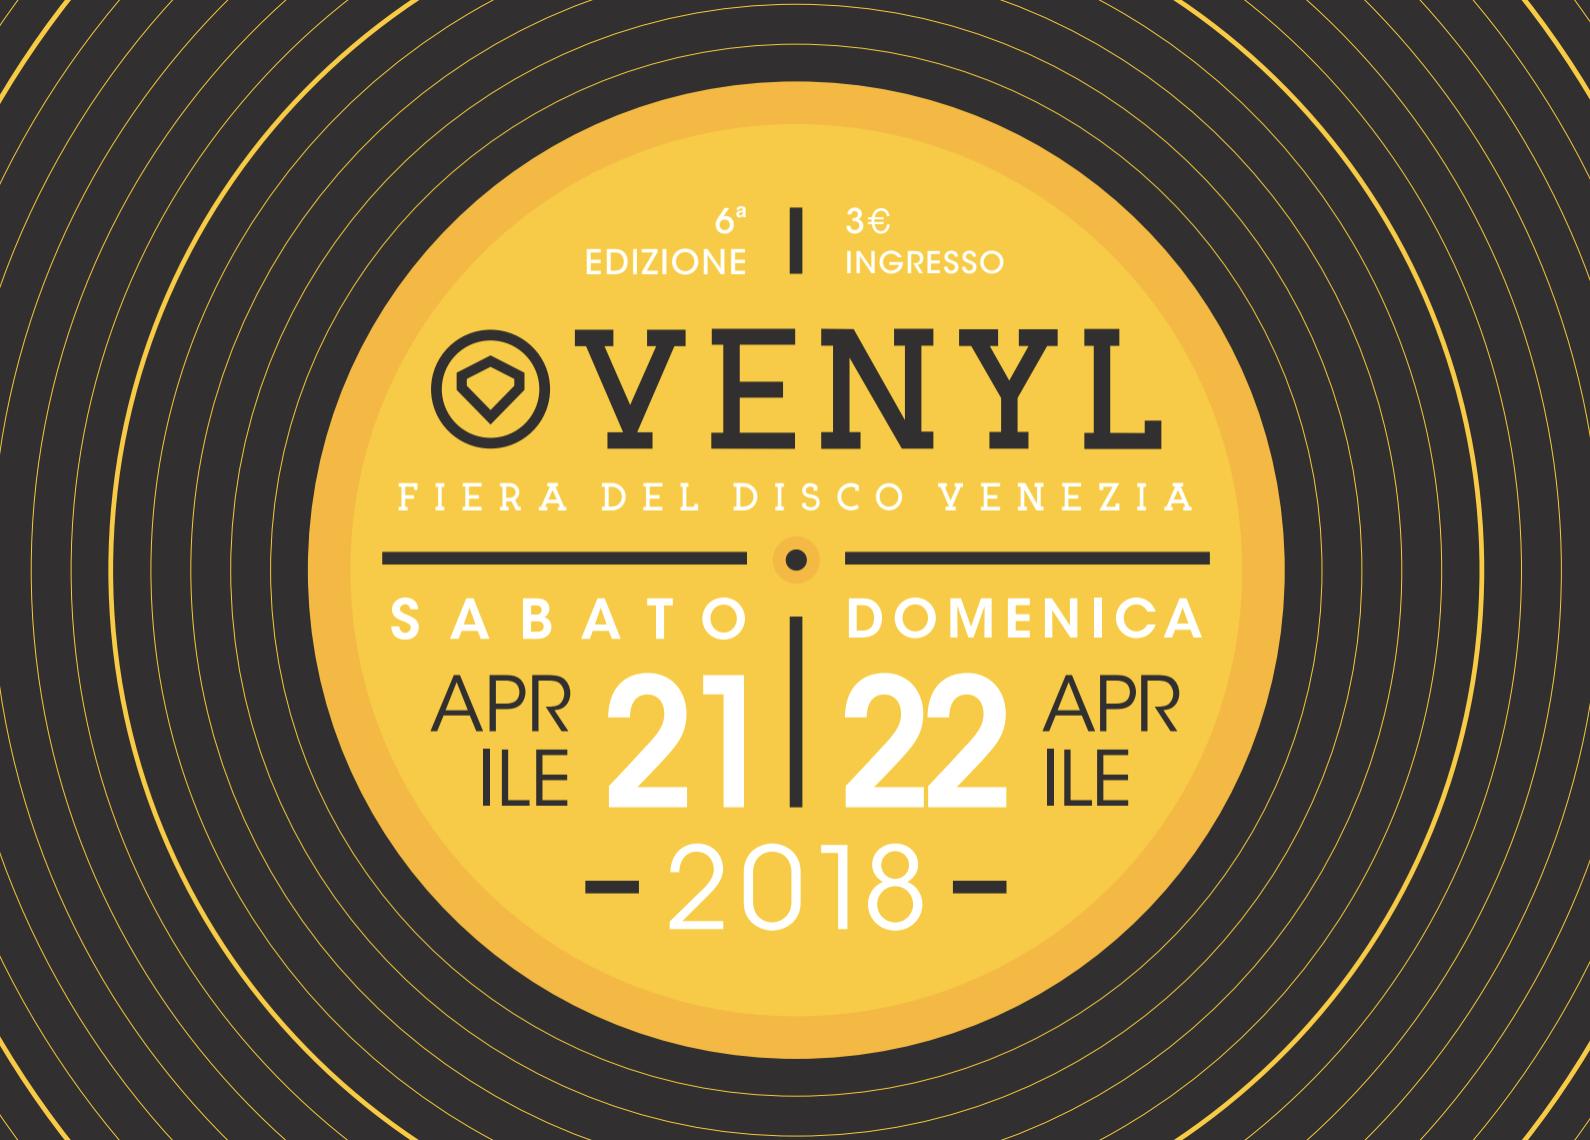 Venyl Venice